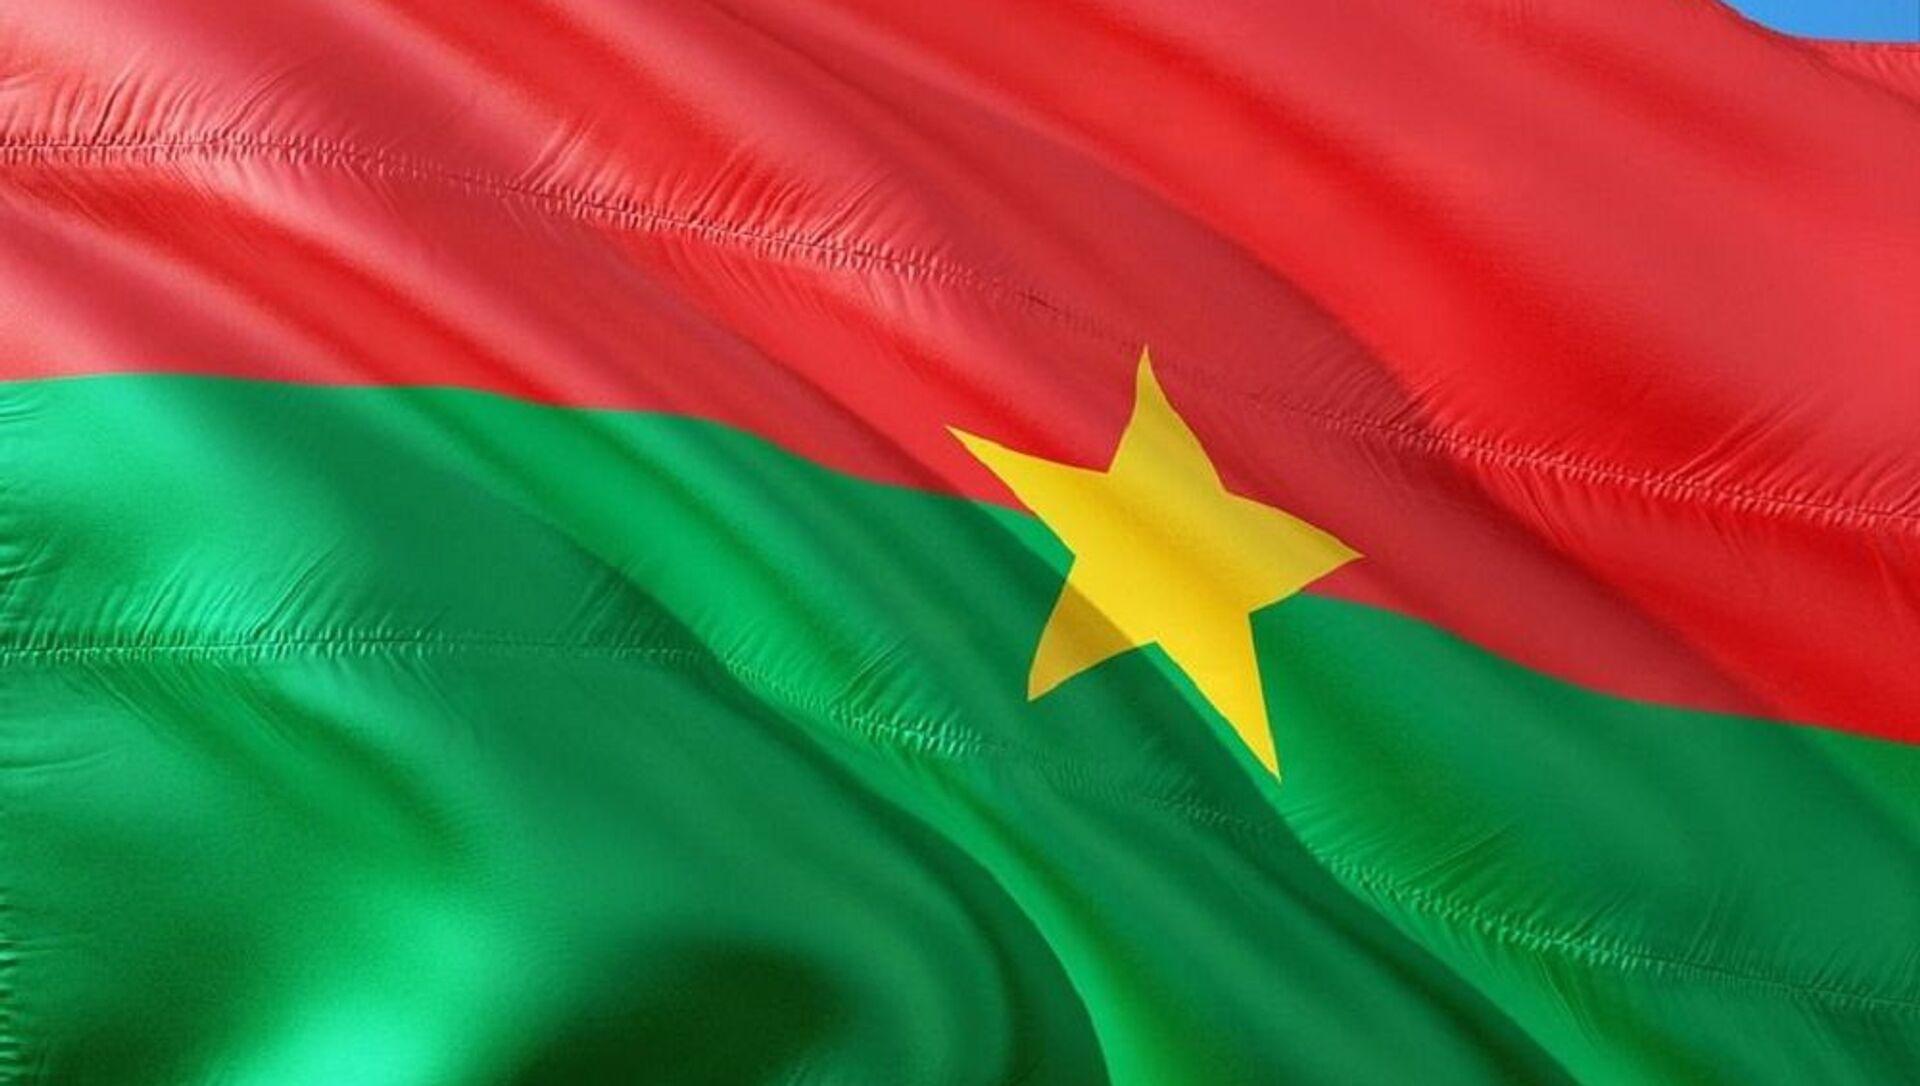 Drapeau Burkina Faso - Sputnik France, 1920, 27.07.2021